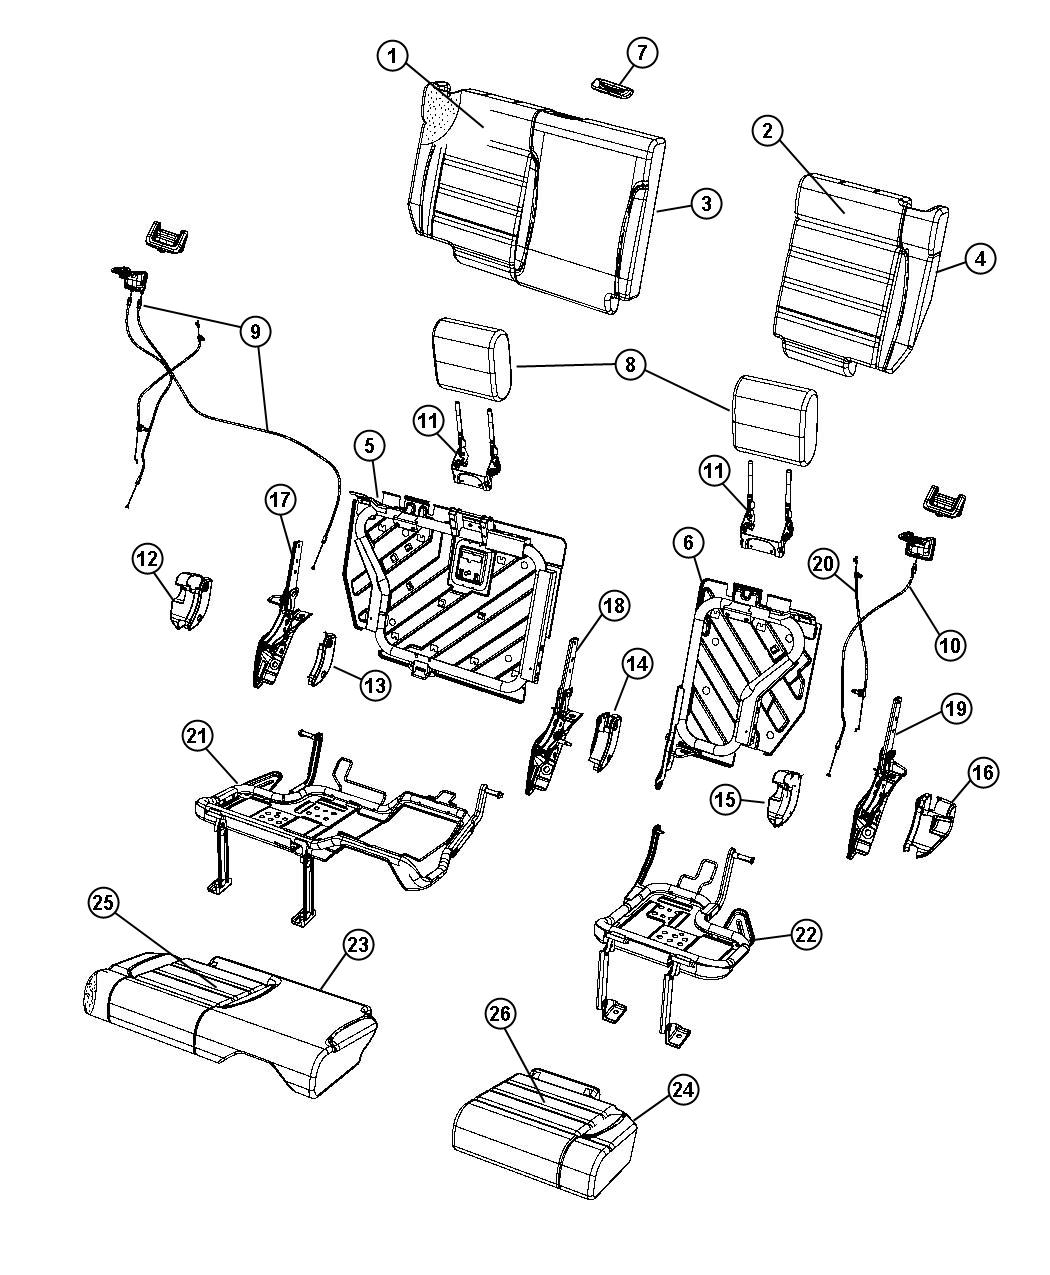 Jeep Wrangler Cover. Rear seat cushion. [dd]. Trim